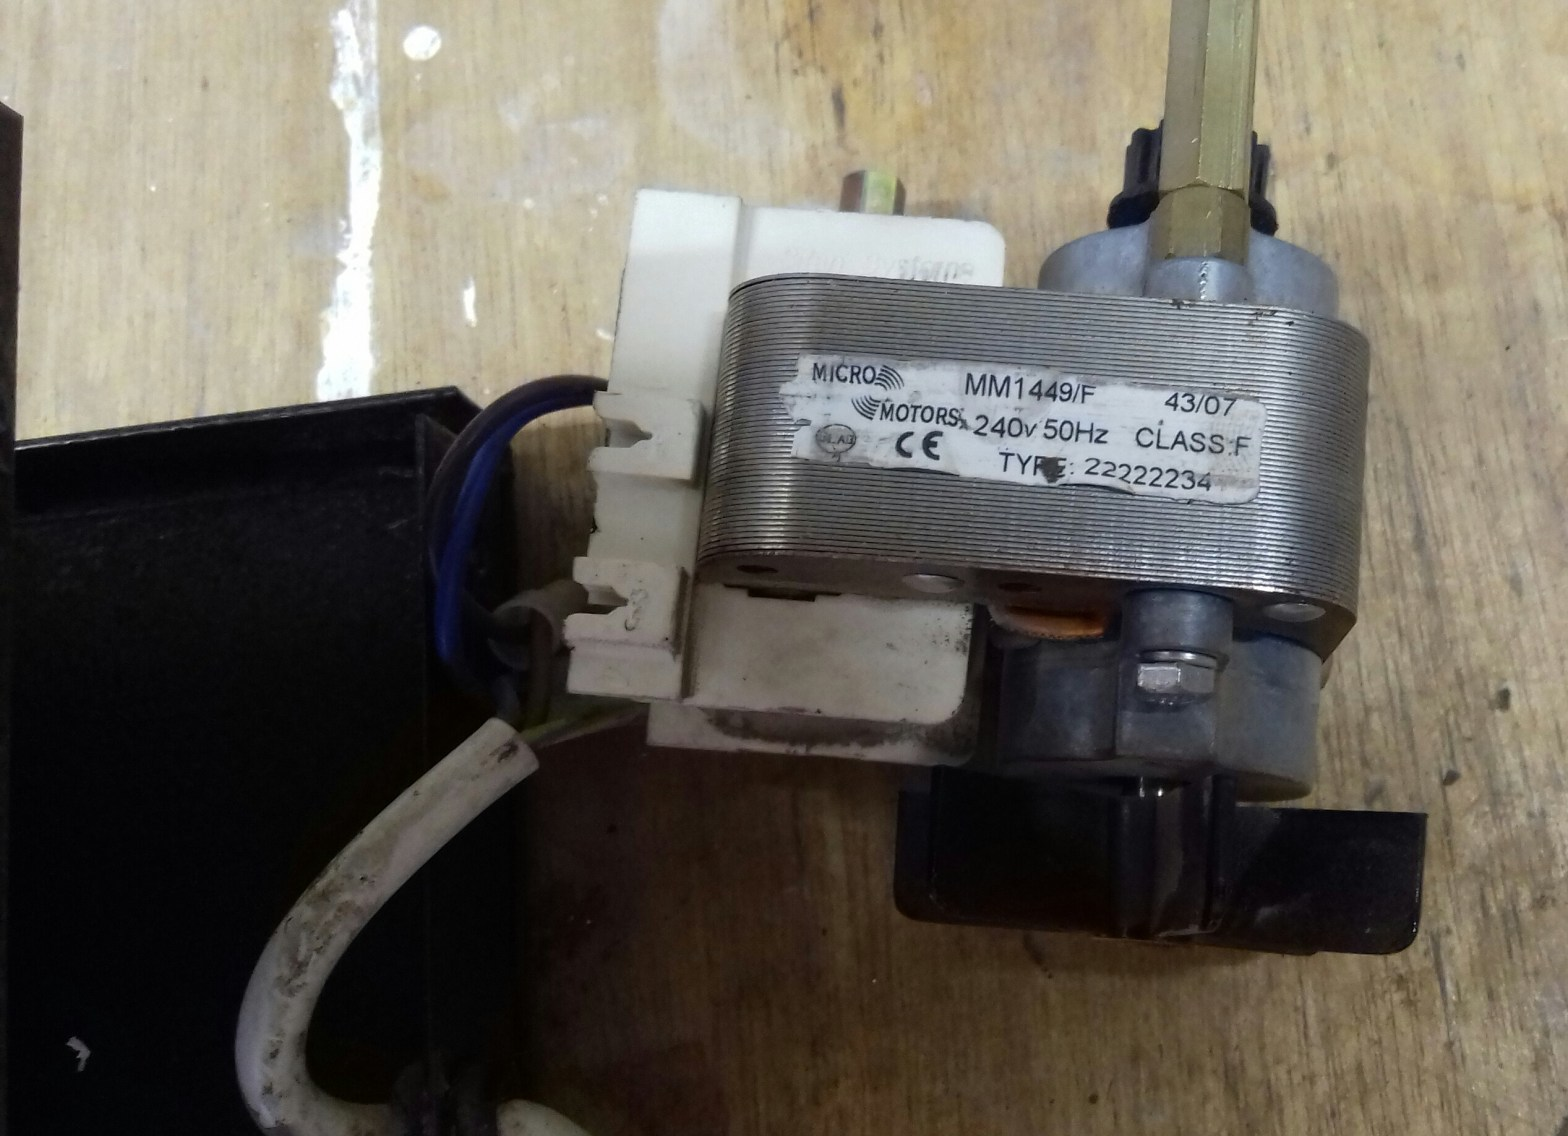 motor problem on our evans cr2 rock tumbler